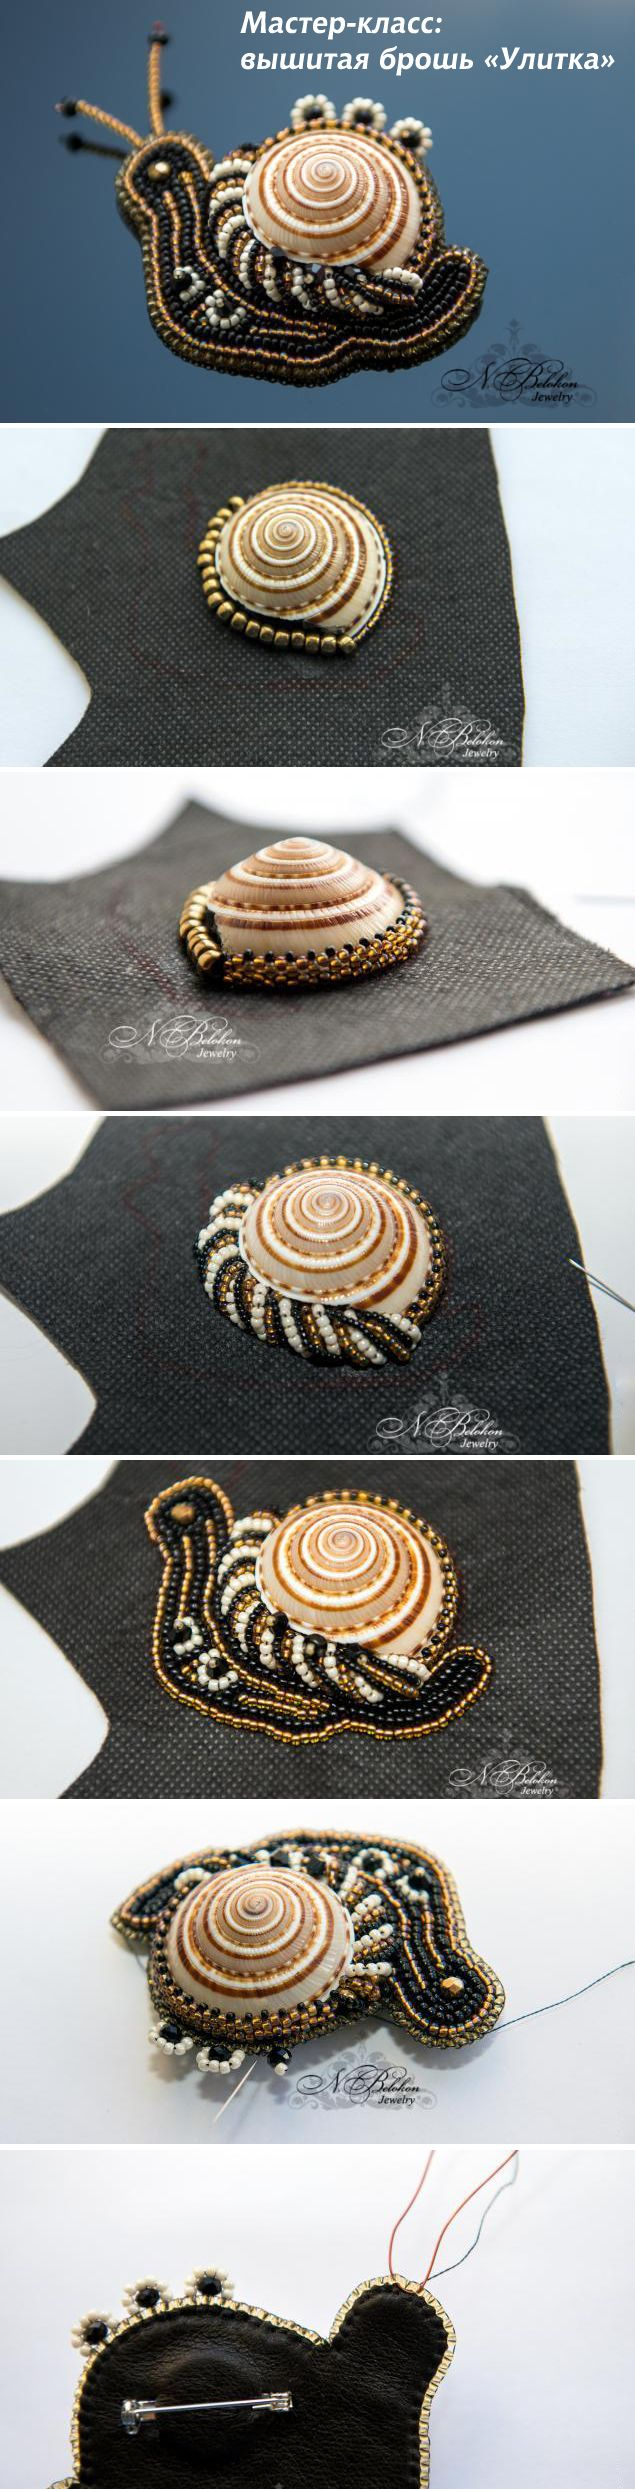 "Мастер-класс по вышивке броши ""Улитка"" / Beaded Brooch ""Snail"" Tutorial #diy #bead"